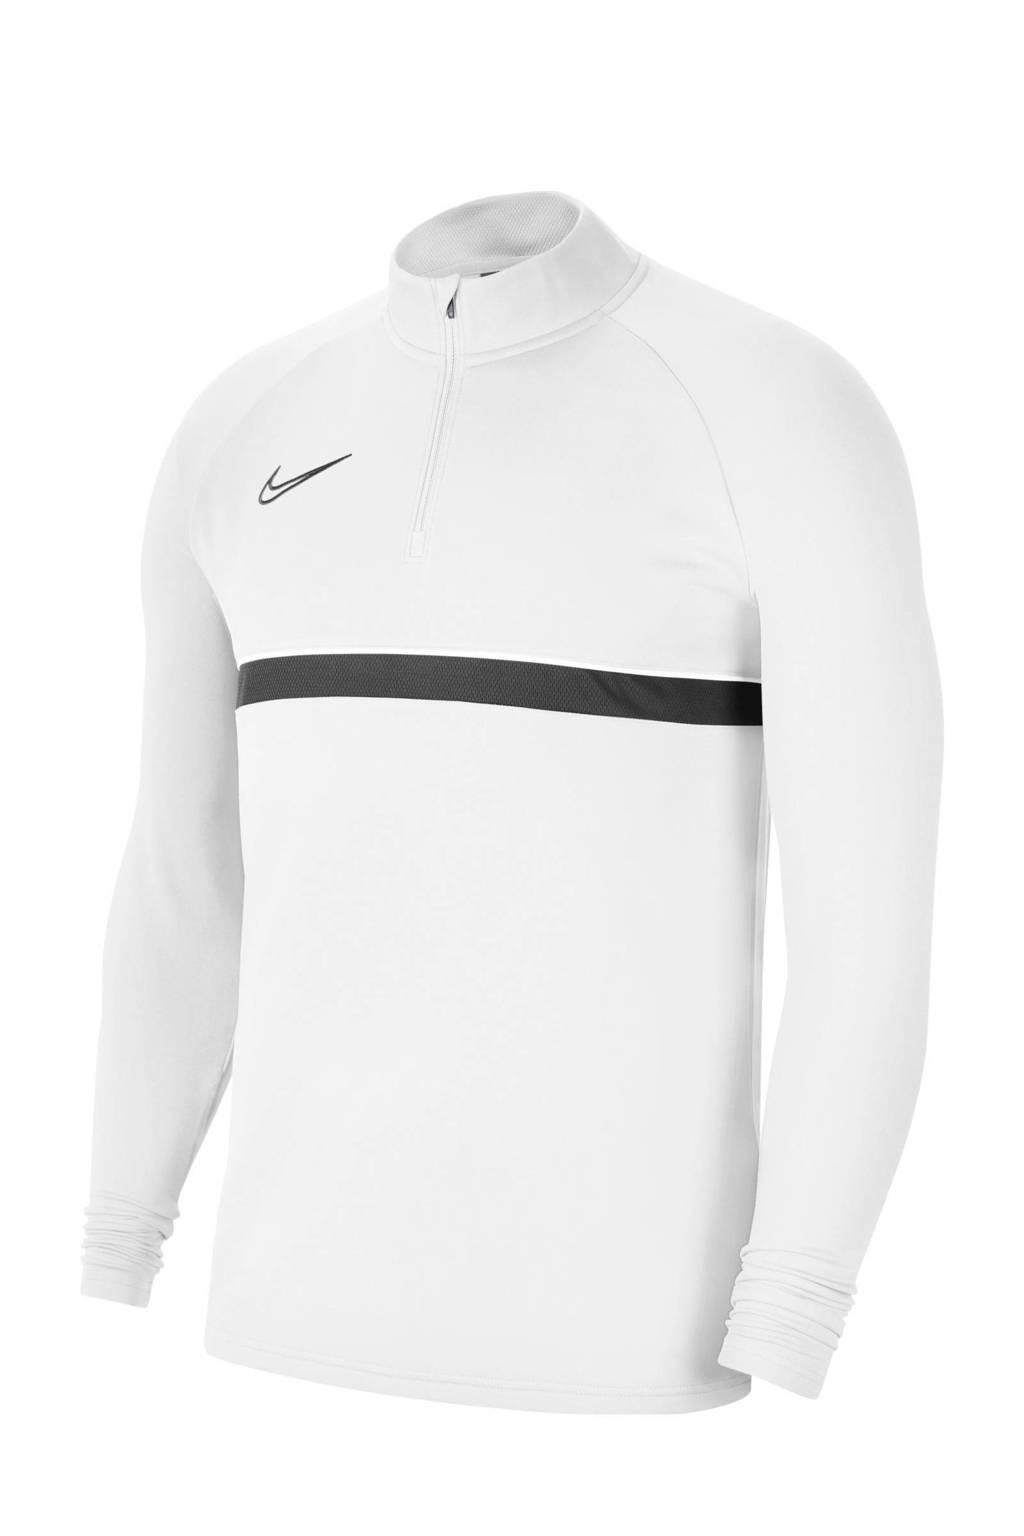 Nike   voetbalshirt wit, Wit